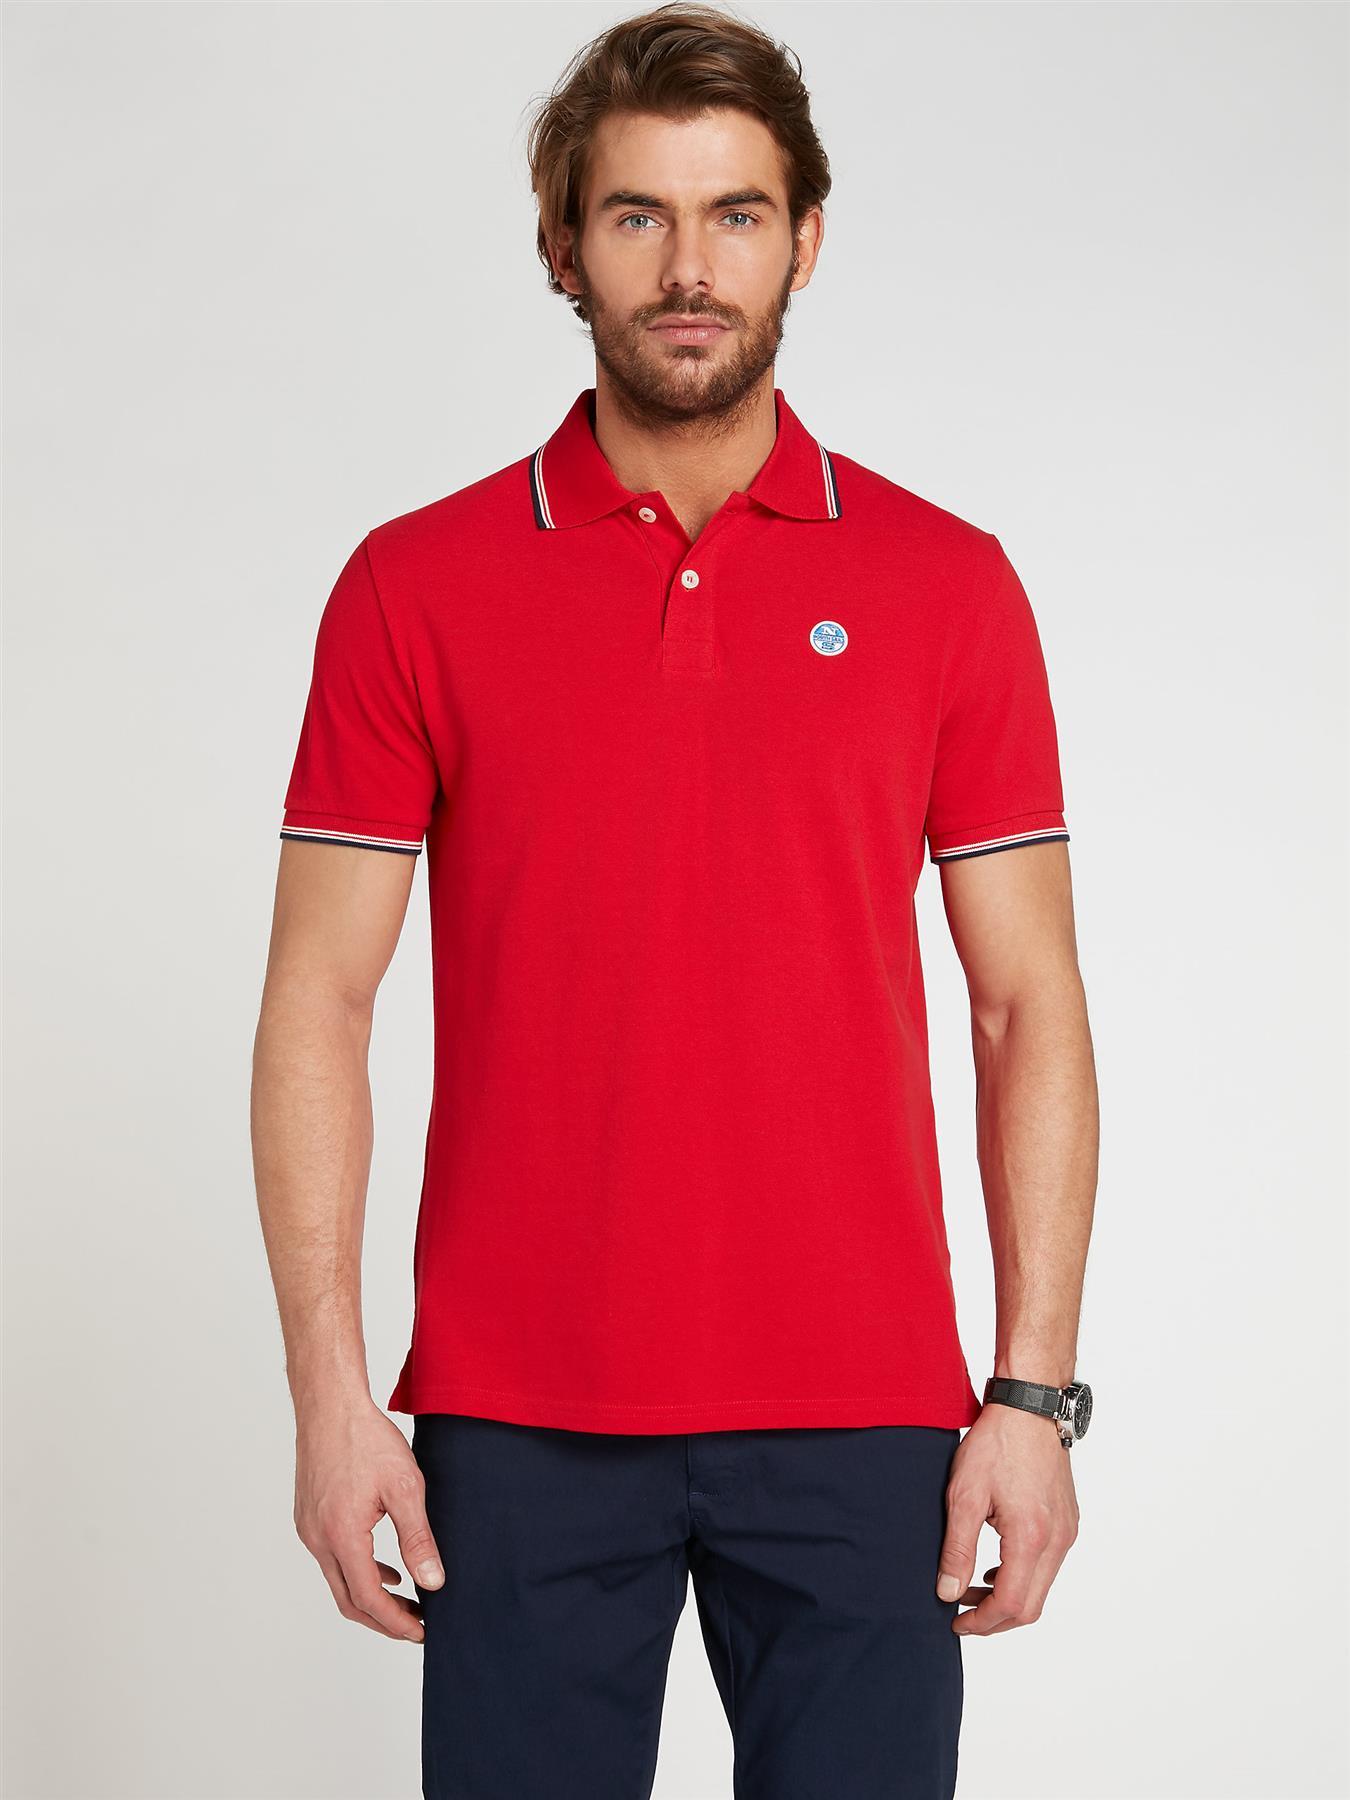 NORTH-SAILS-Mens-Legacy-Heritage-Short-Sleeve-Polo-Shirt-SALE-RRP-50 thumbnail 47